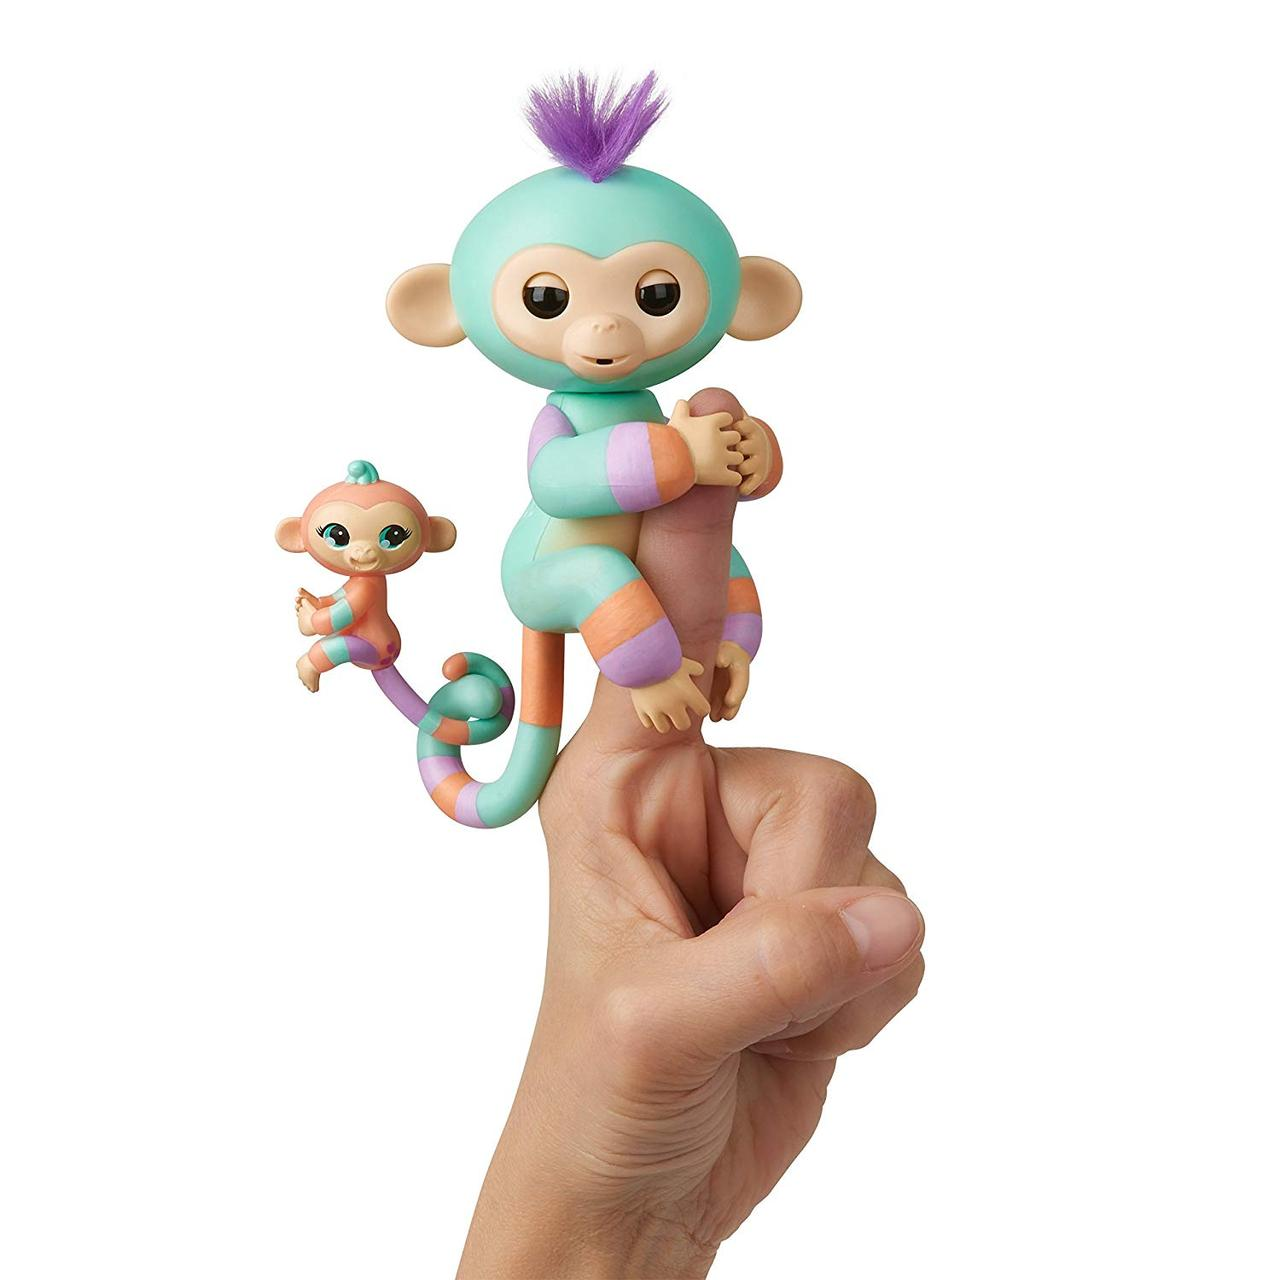 WowWee Fingerlings Интерактивная ручная обезьянка с малышкой Danny Gianna Baby Monkey Mini Оригинал!